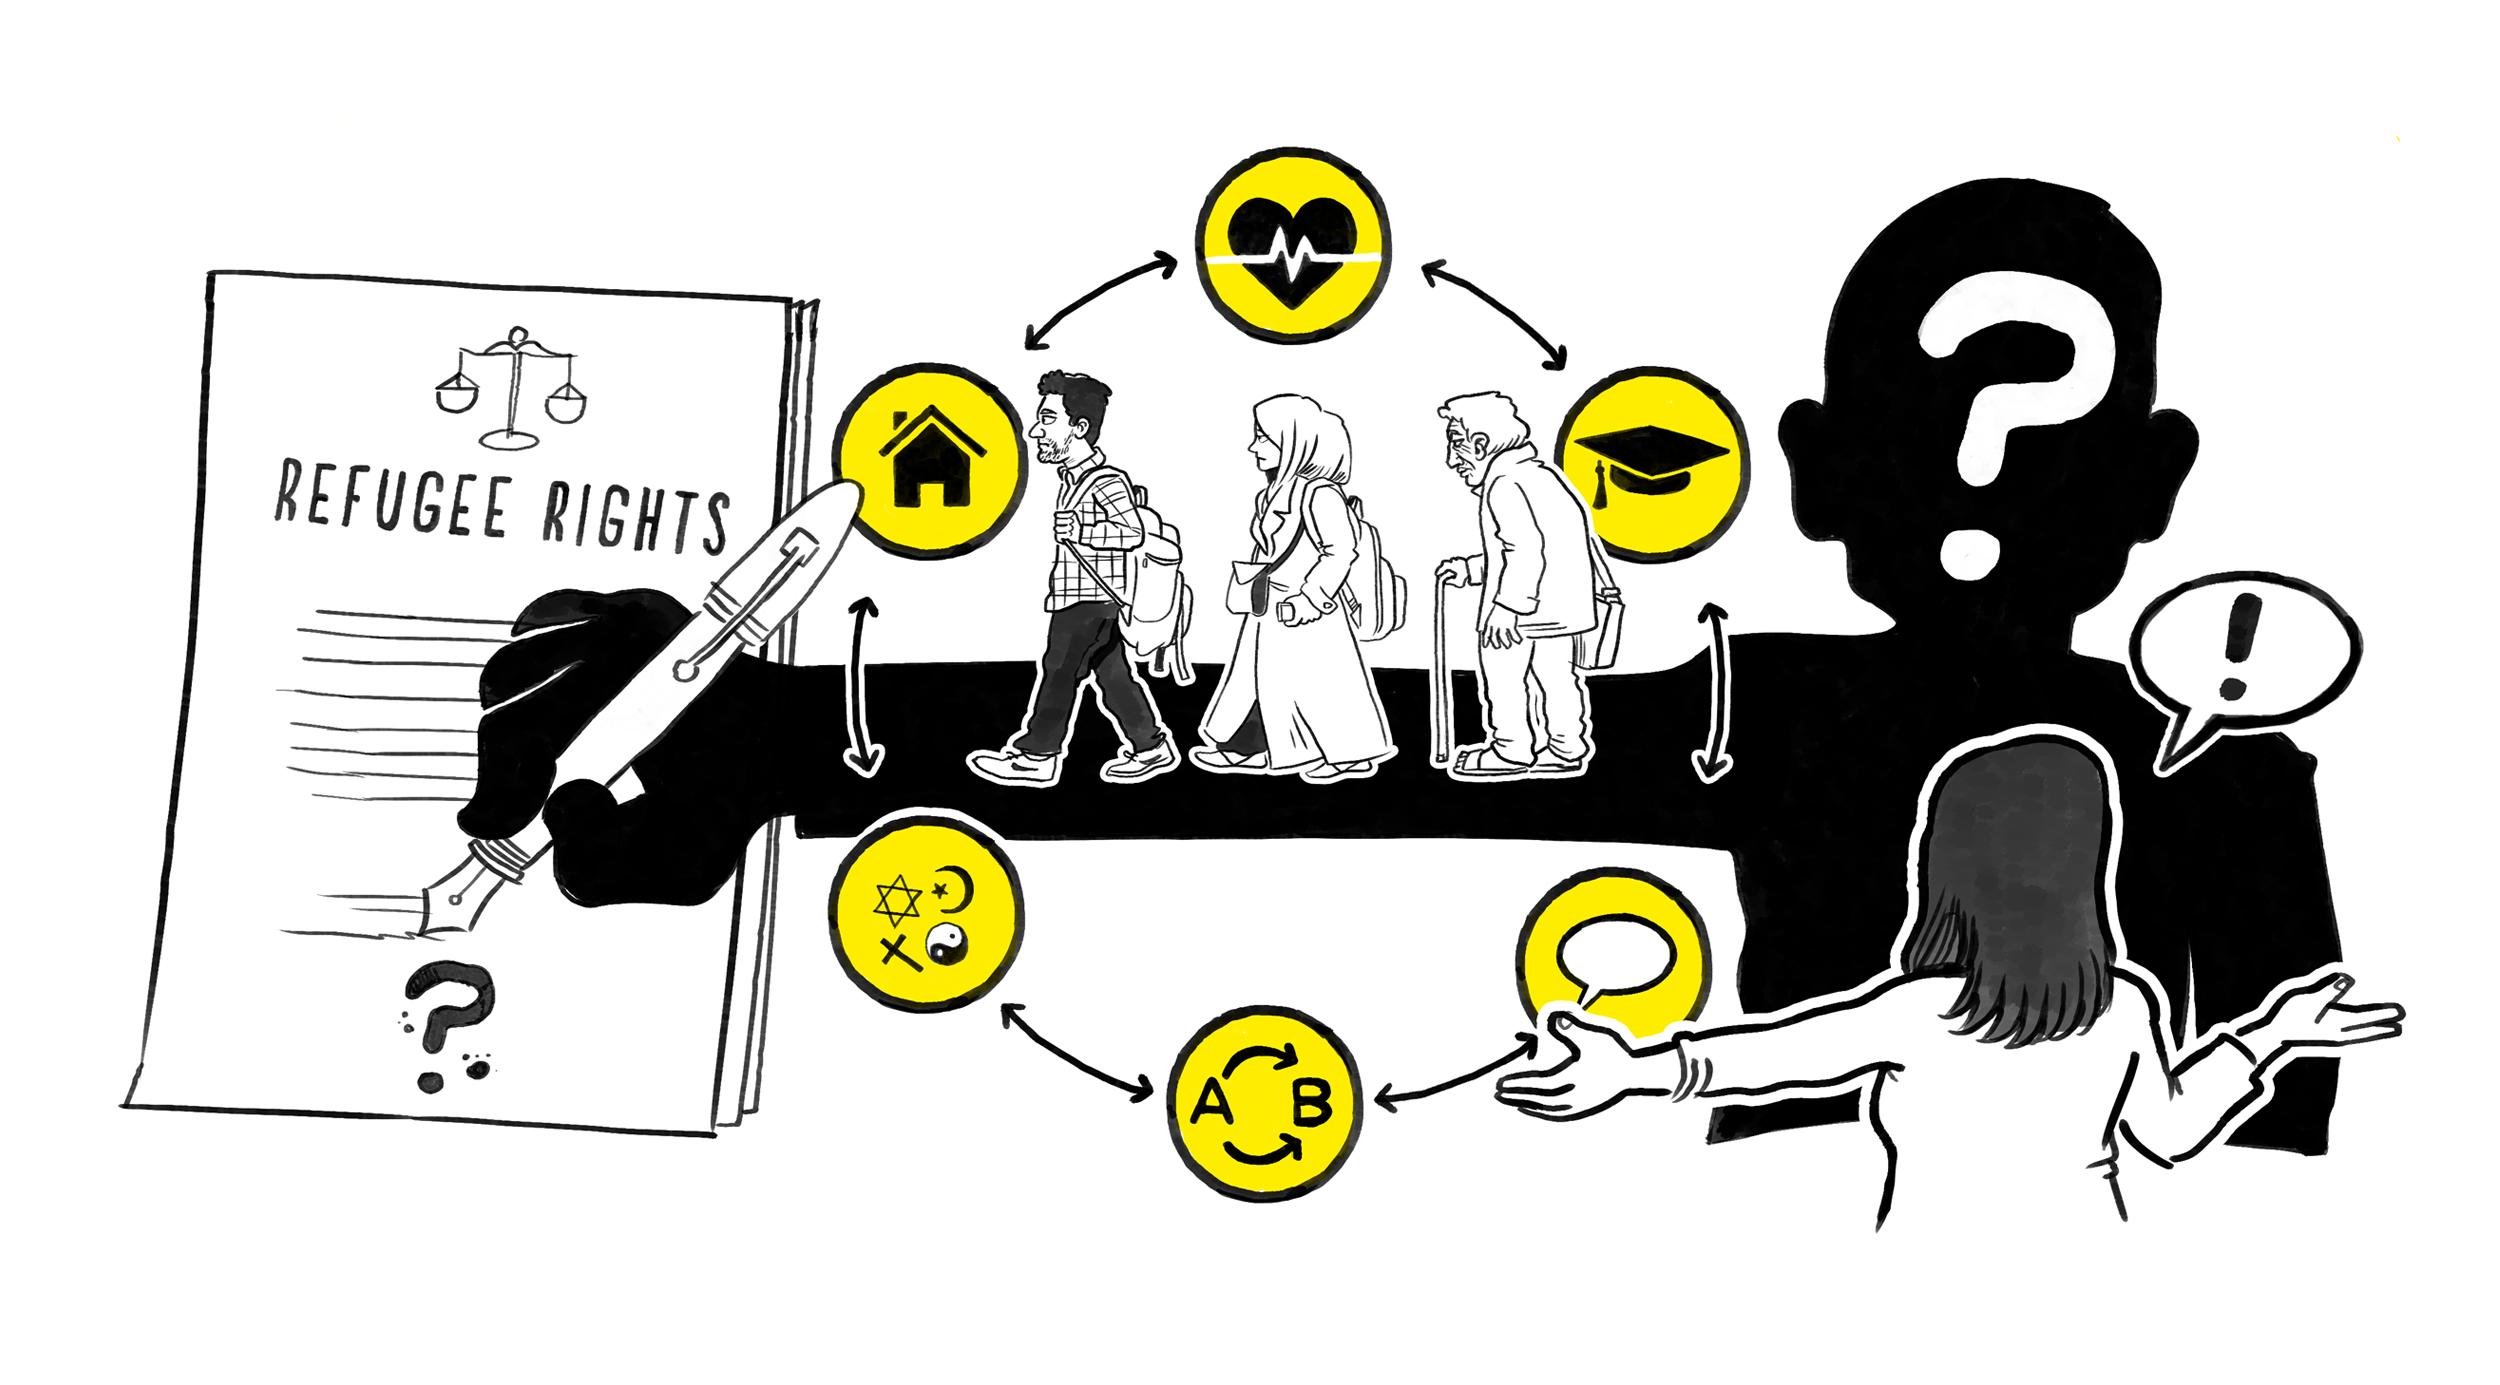 amnesty-international-promo-cognitive-07.jpg